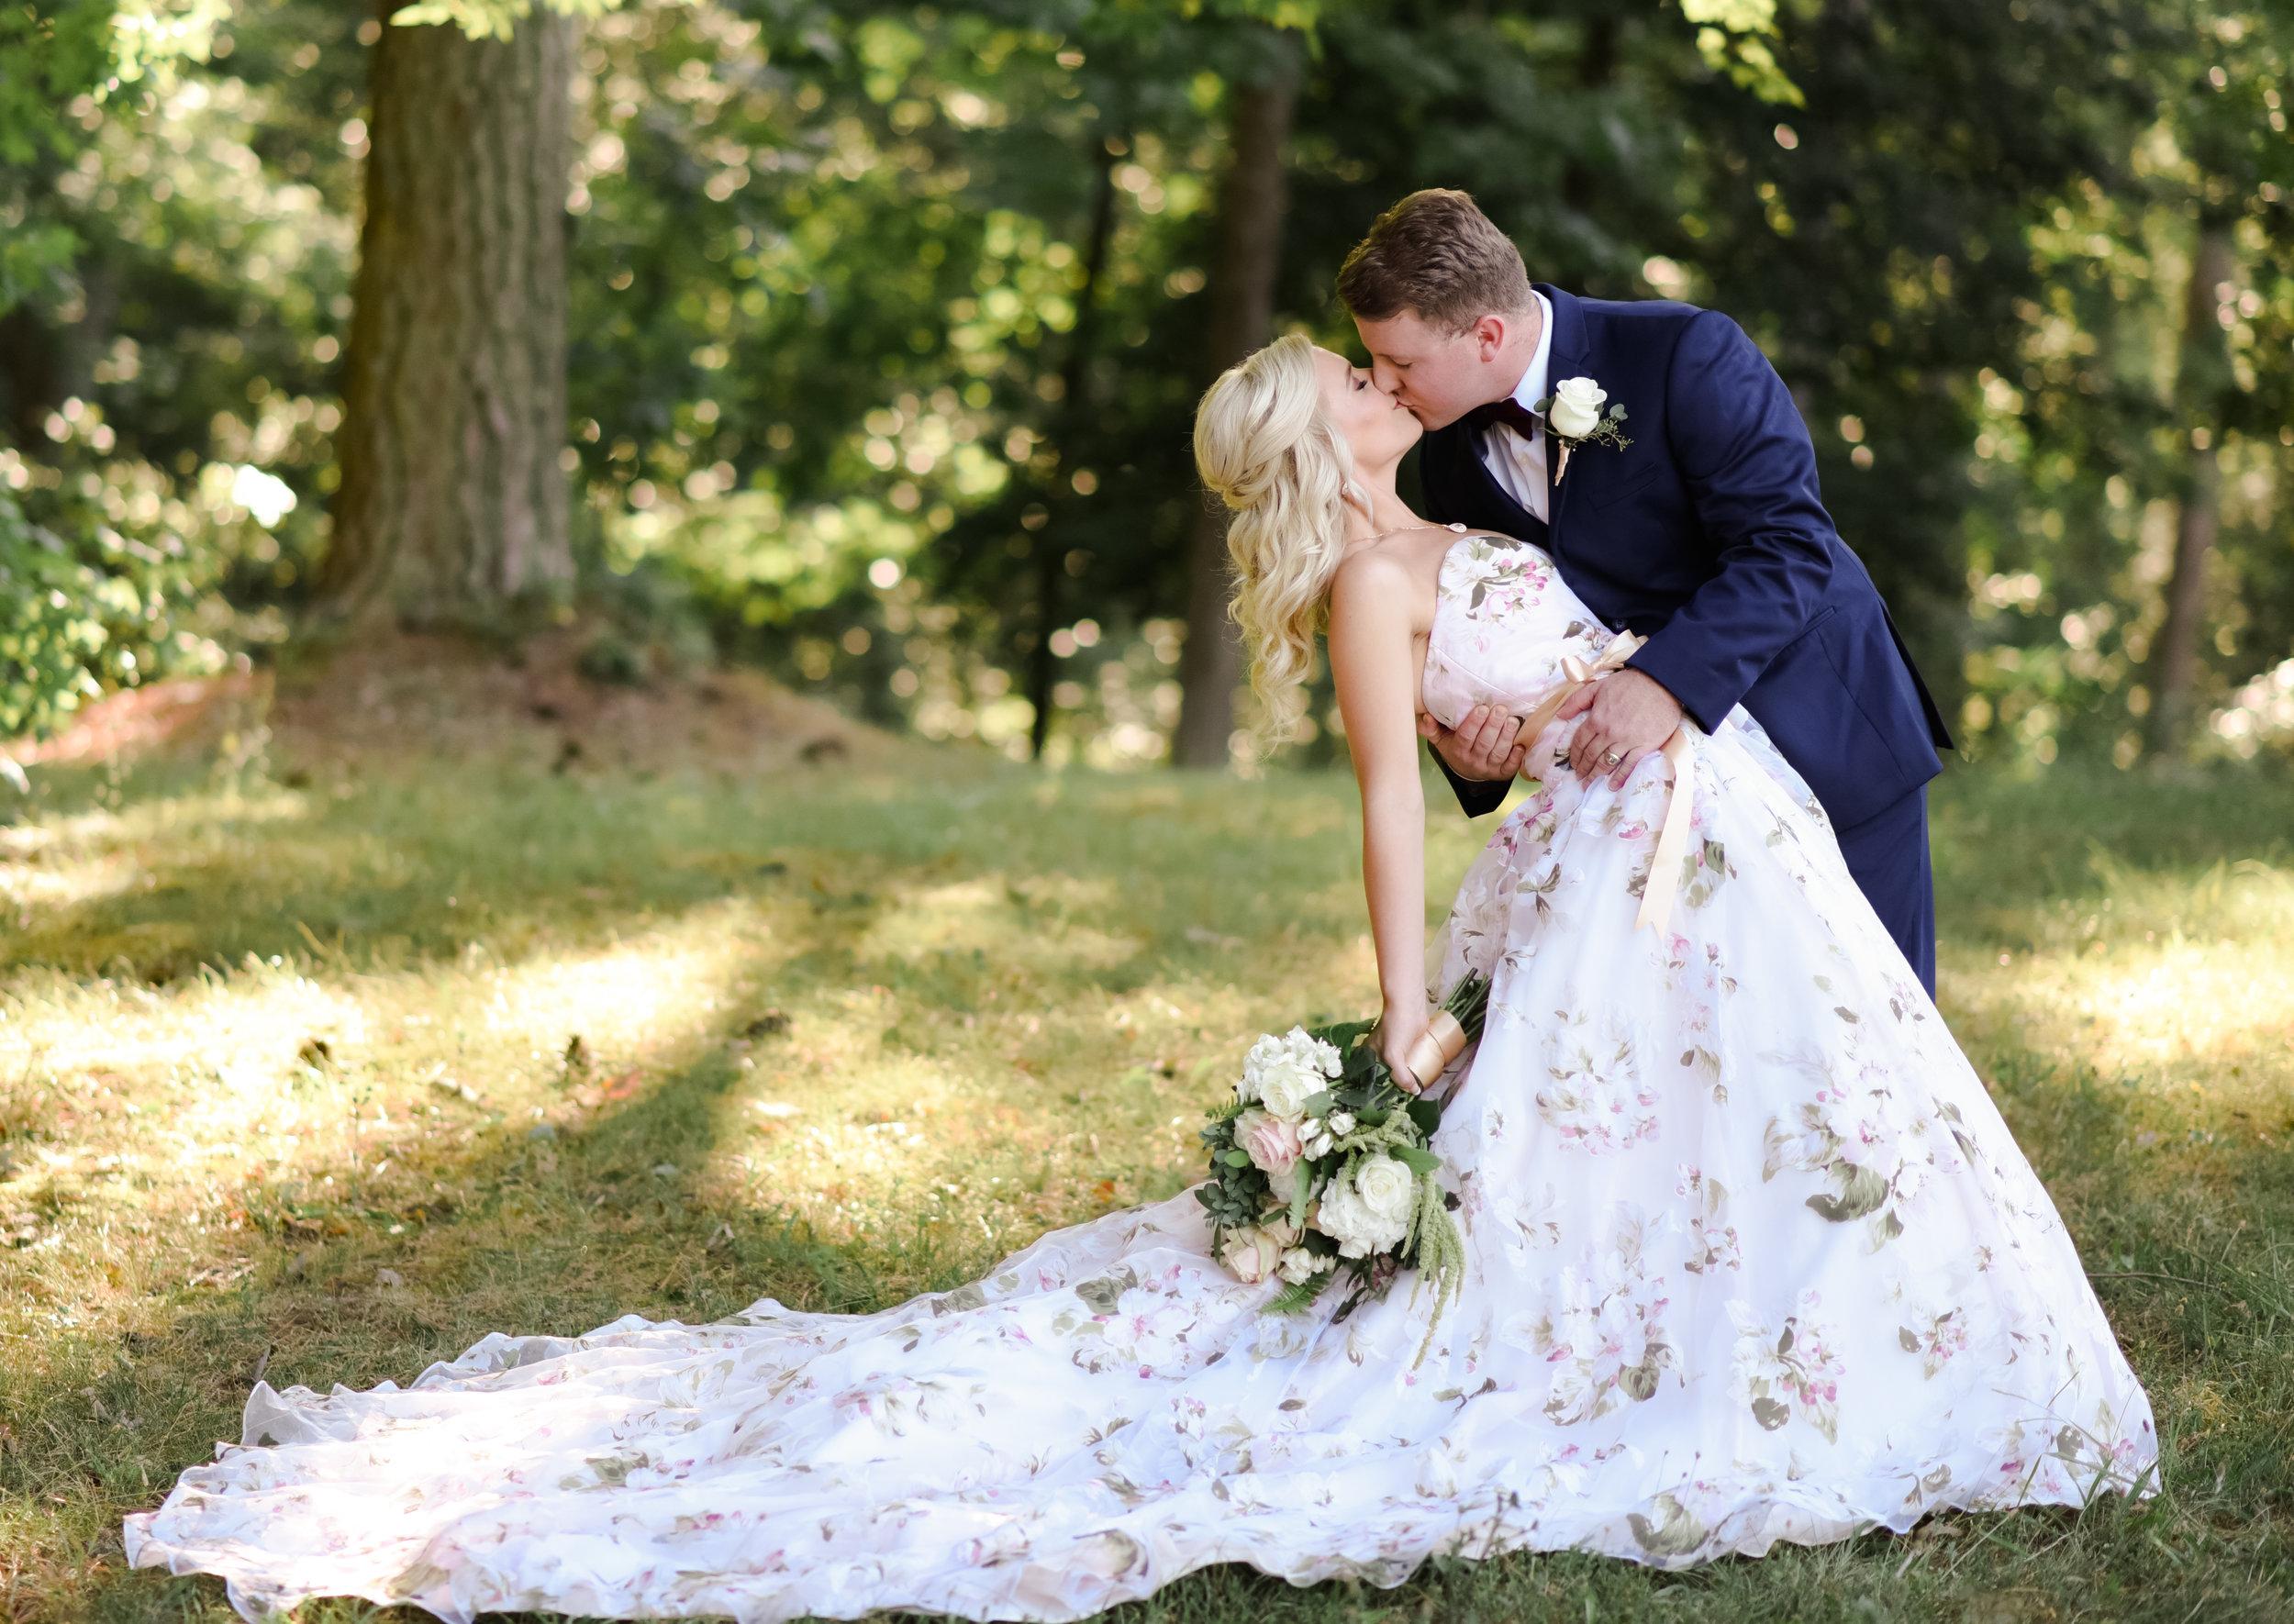 midsummers-eve-wedding-floral-blush-dress-david-tutera-cary-hill-plantation-photo-virginia-bride-150.jpg